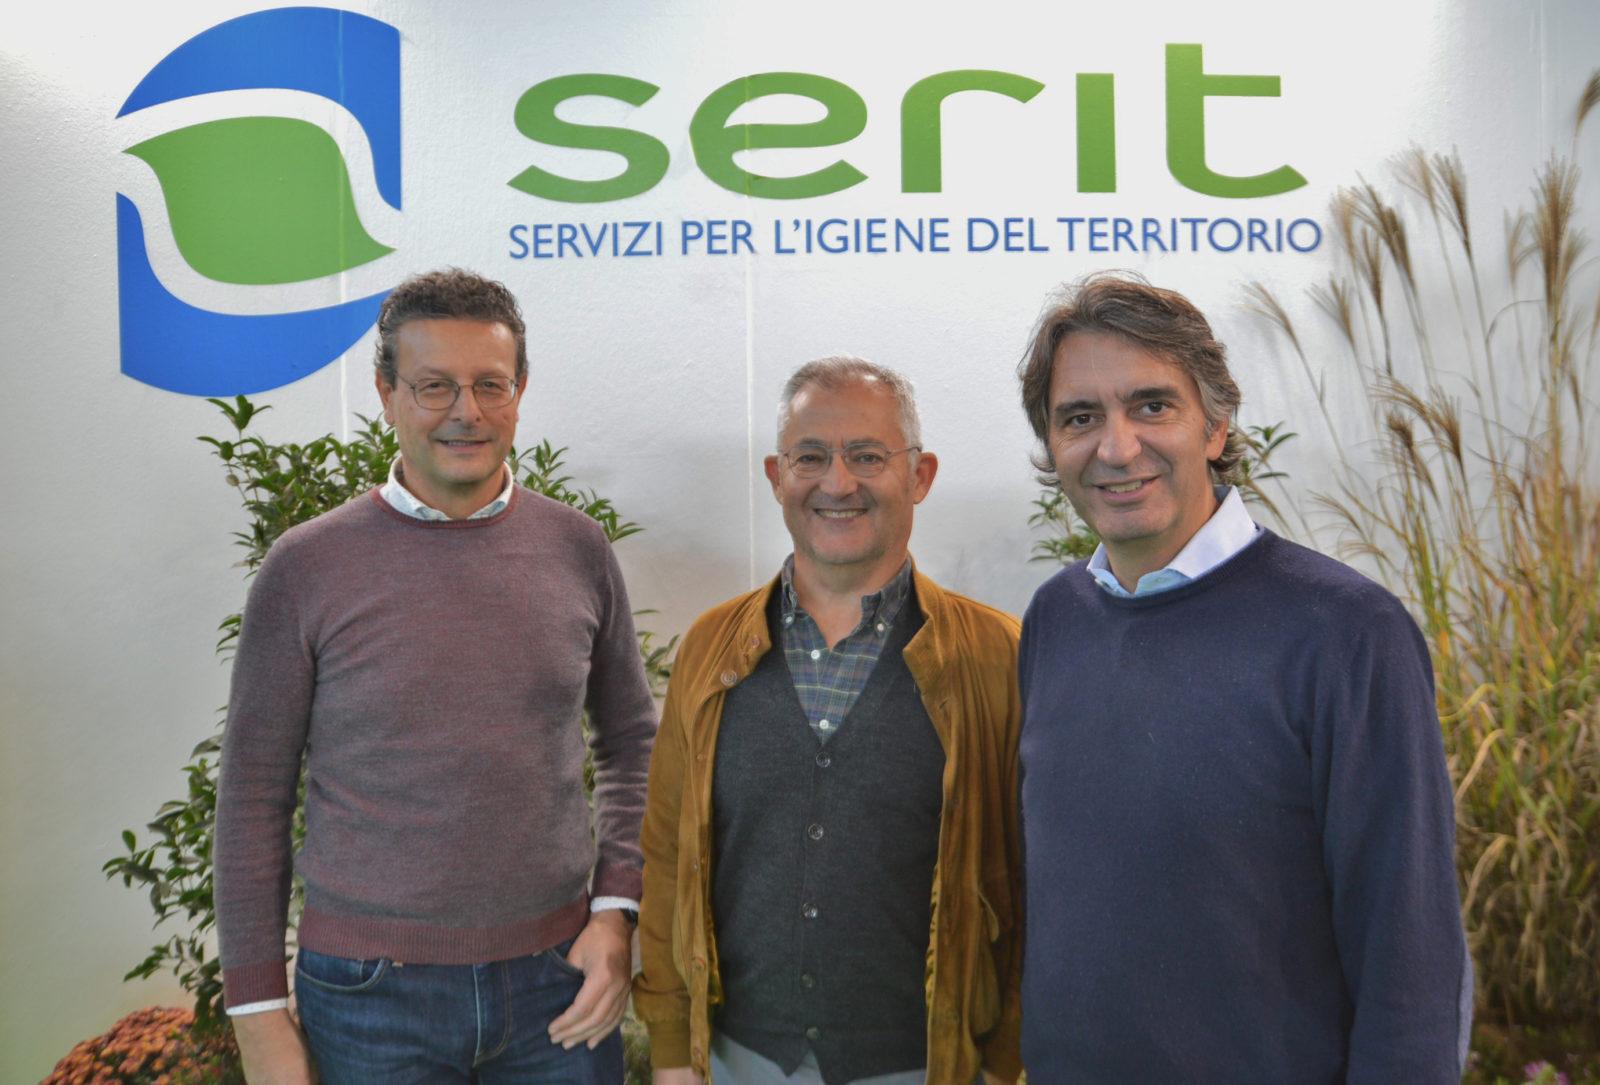 Maurizio Alfeo, Massimo Mariotti, Federico Sboarina